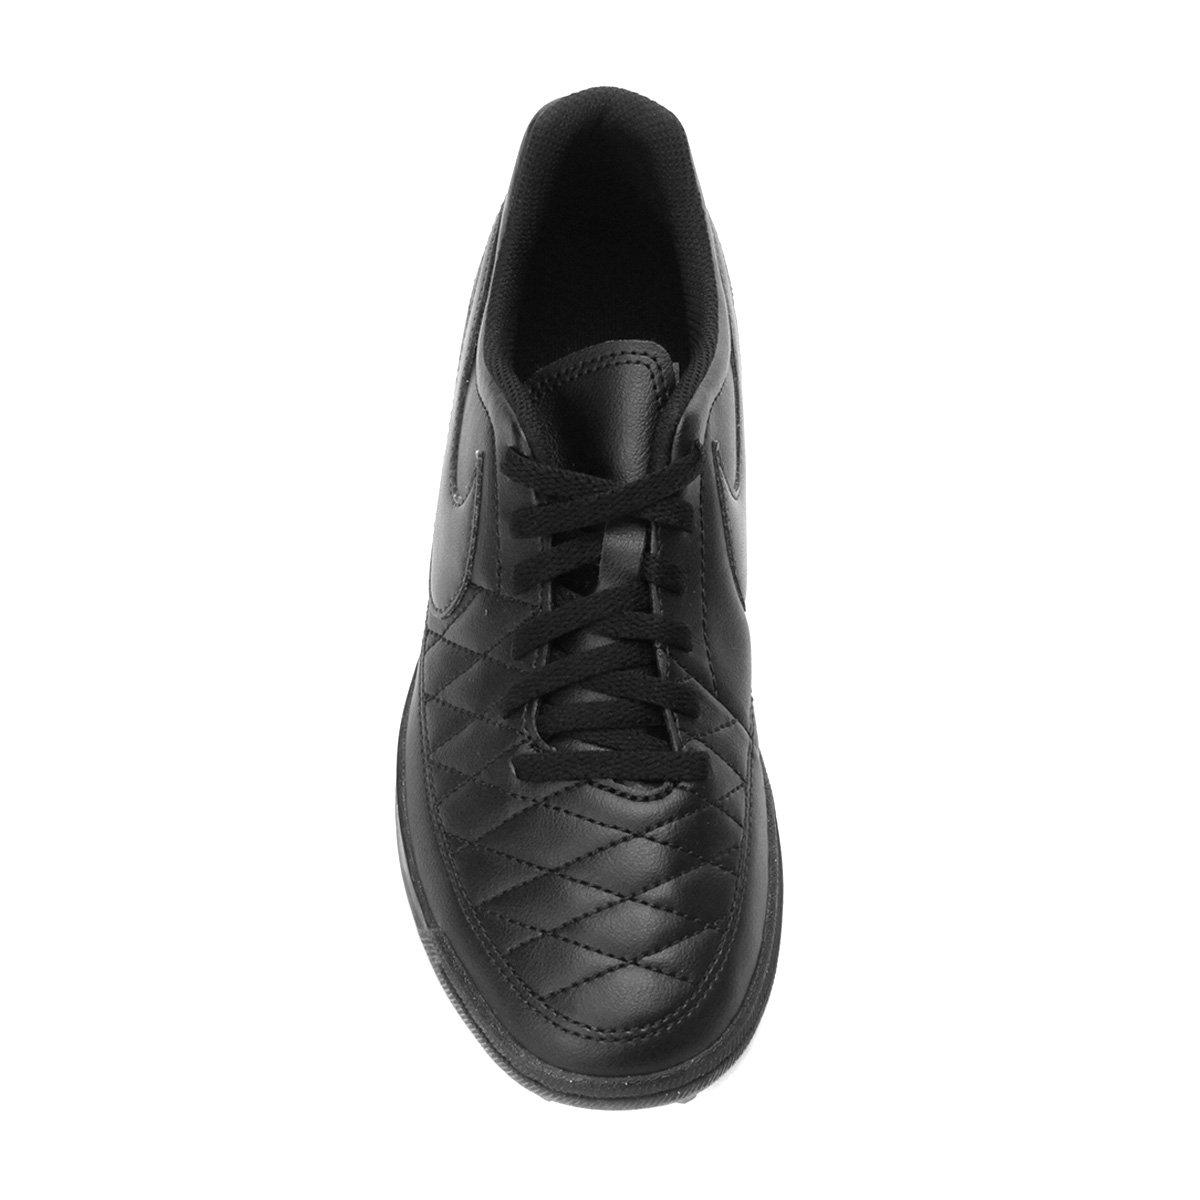 Chuteira Society Nike Majestry TF - Preto - Compre Agora  c263b876f8862